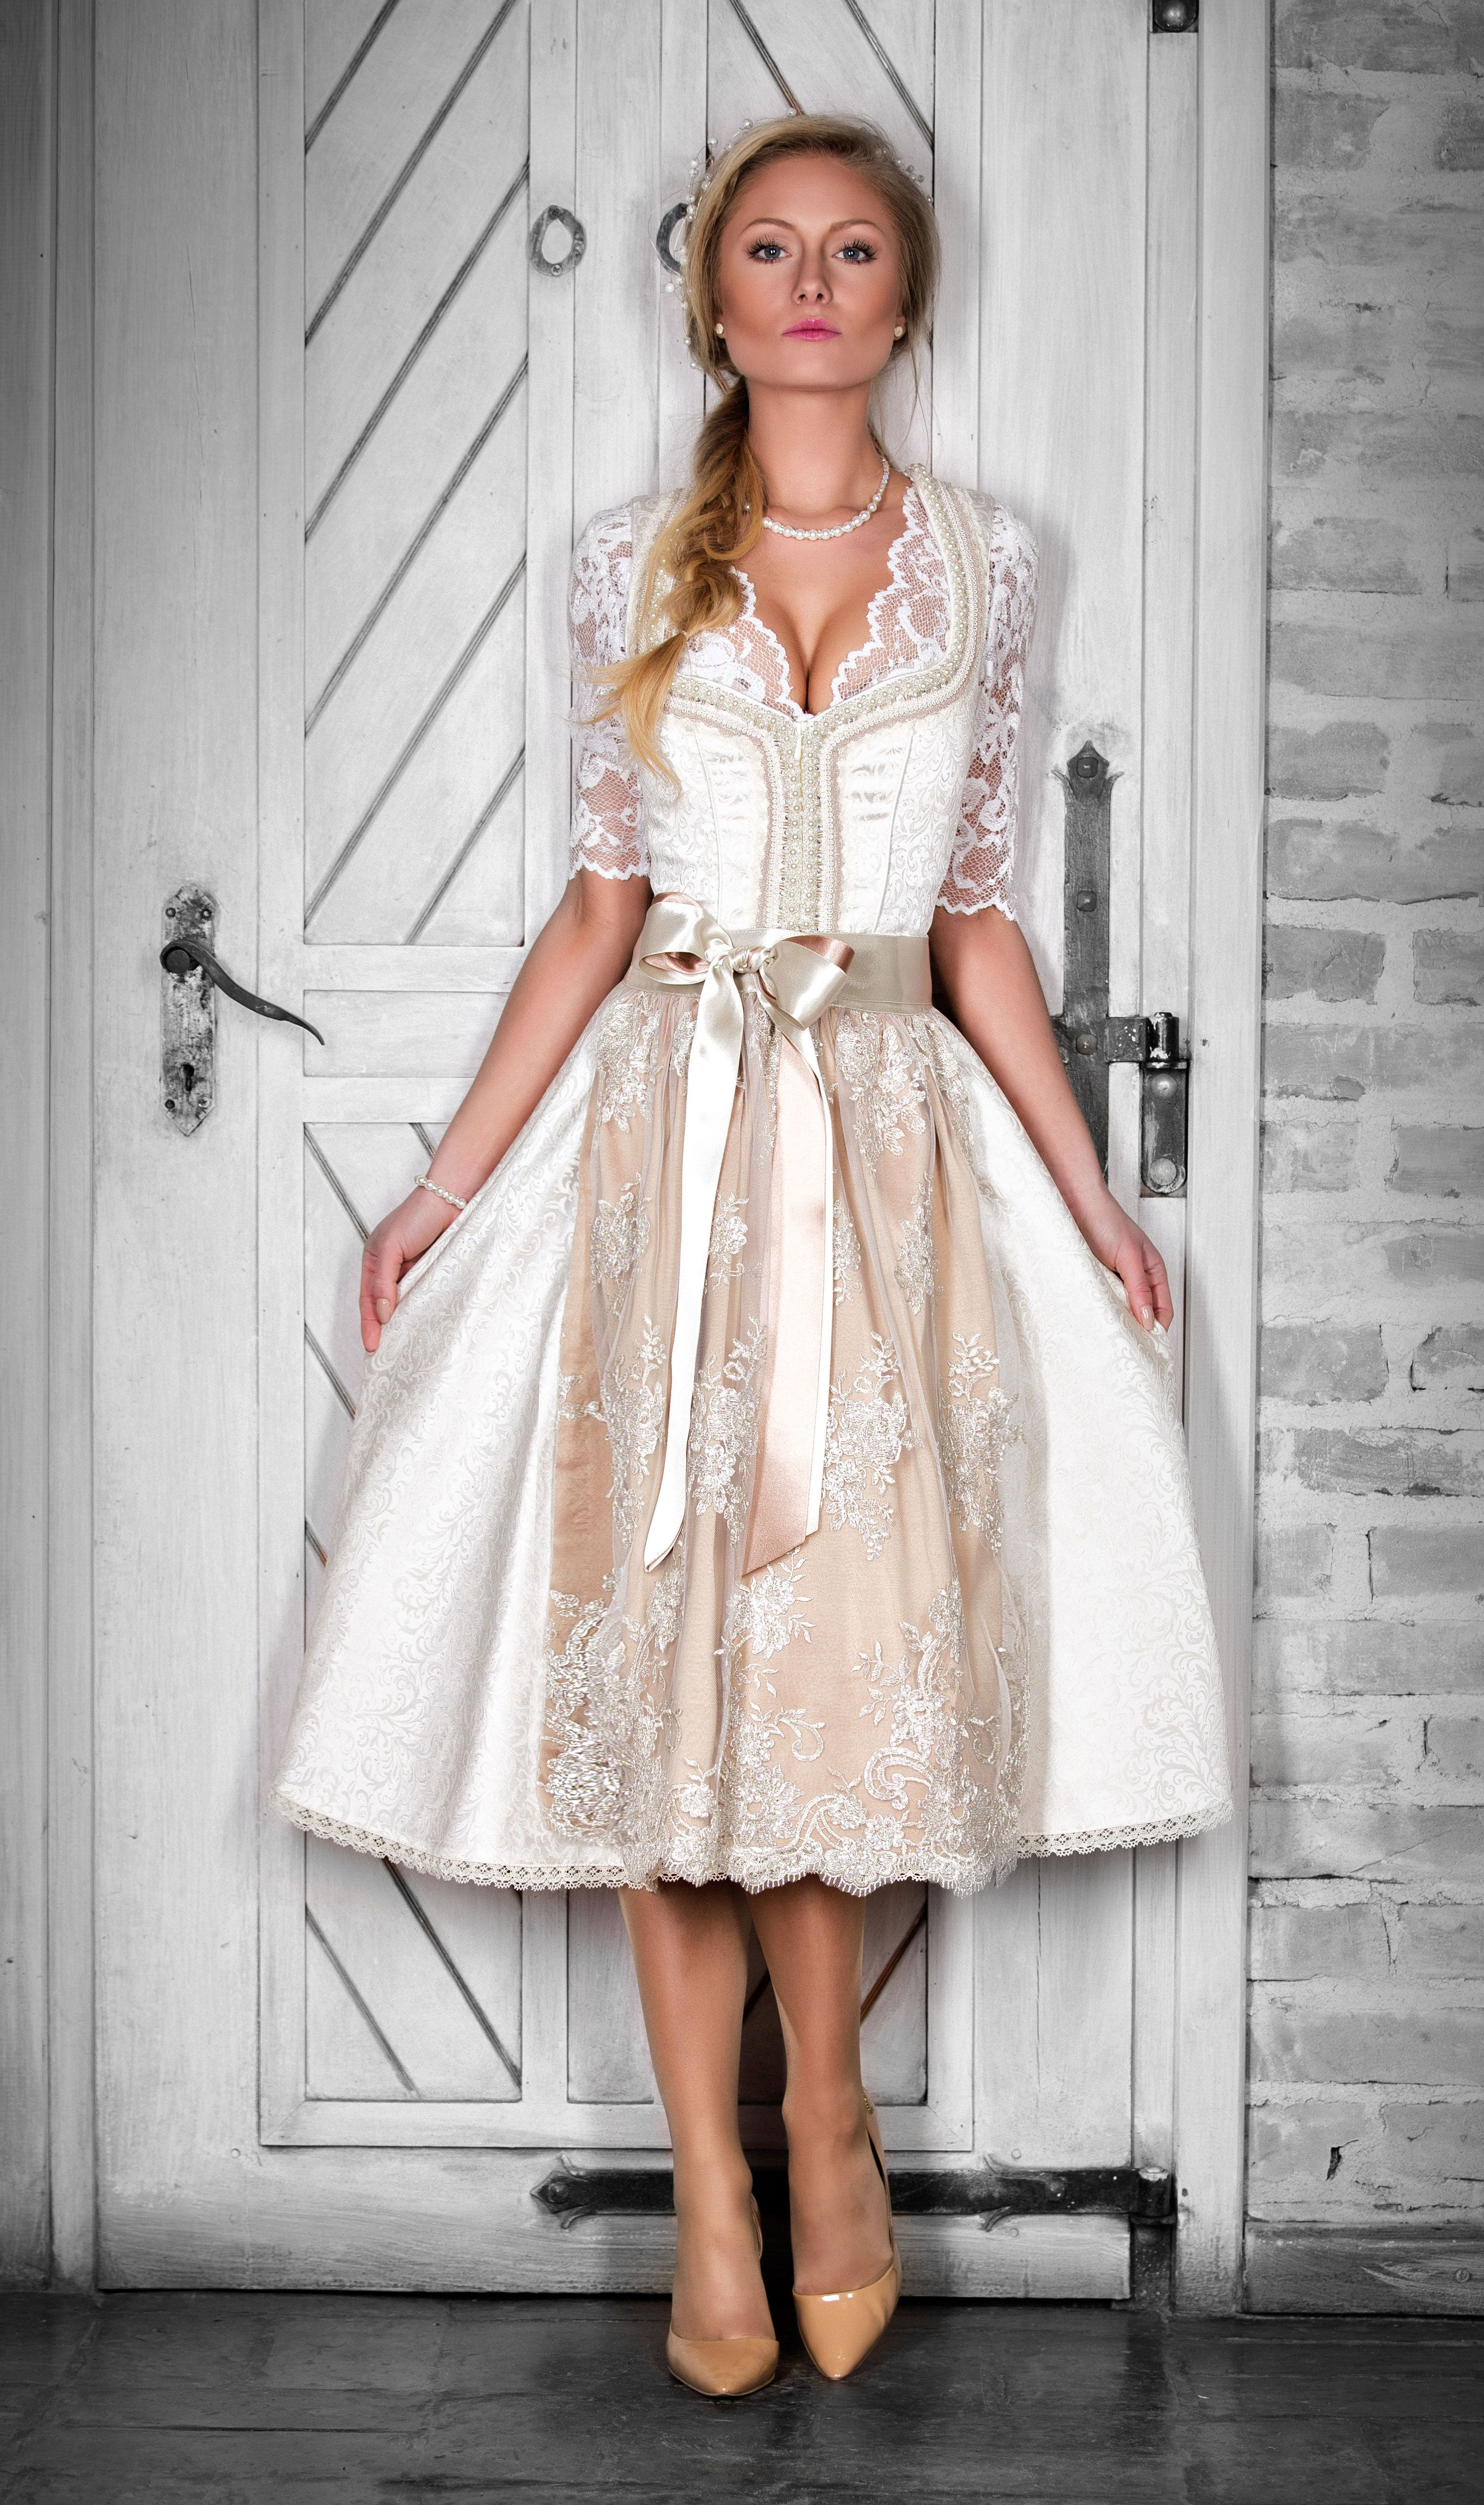 Pin By Jaidi On Dresses Pinterest Dirndl Dresses And Wedding